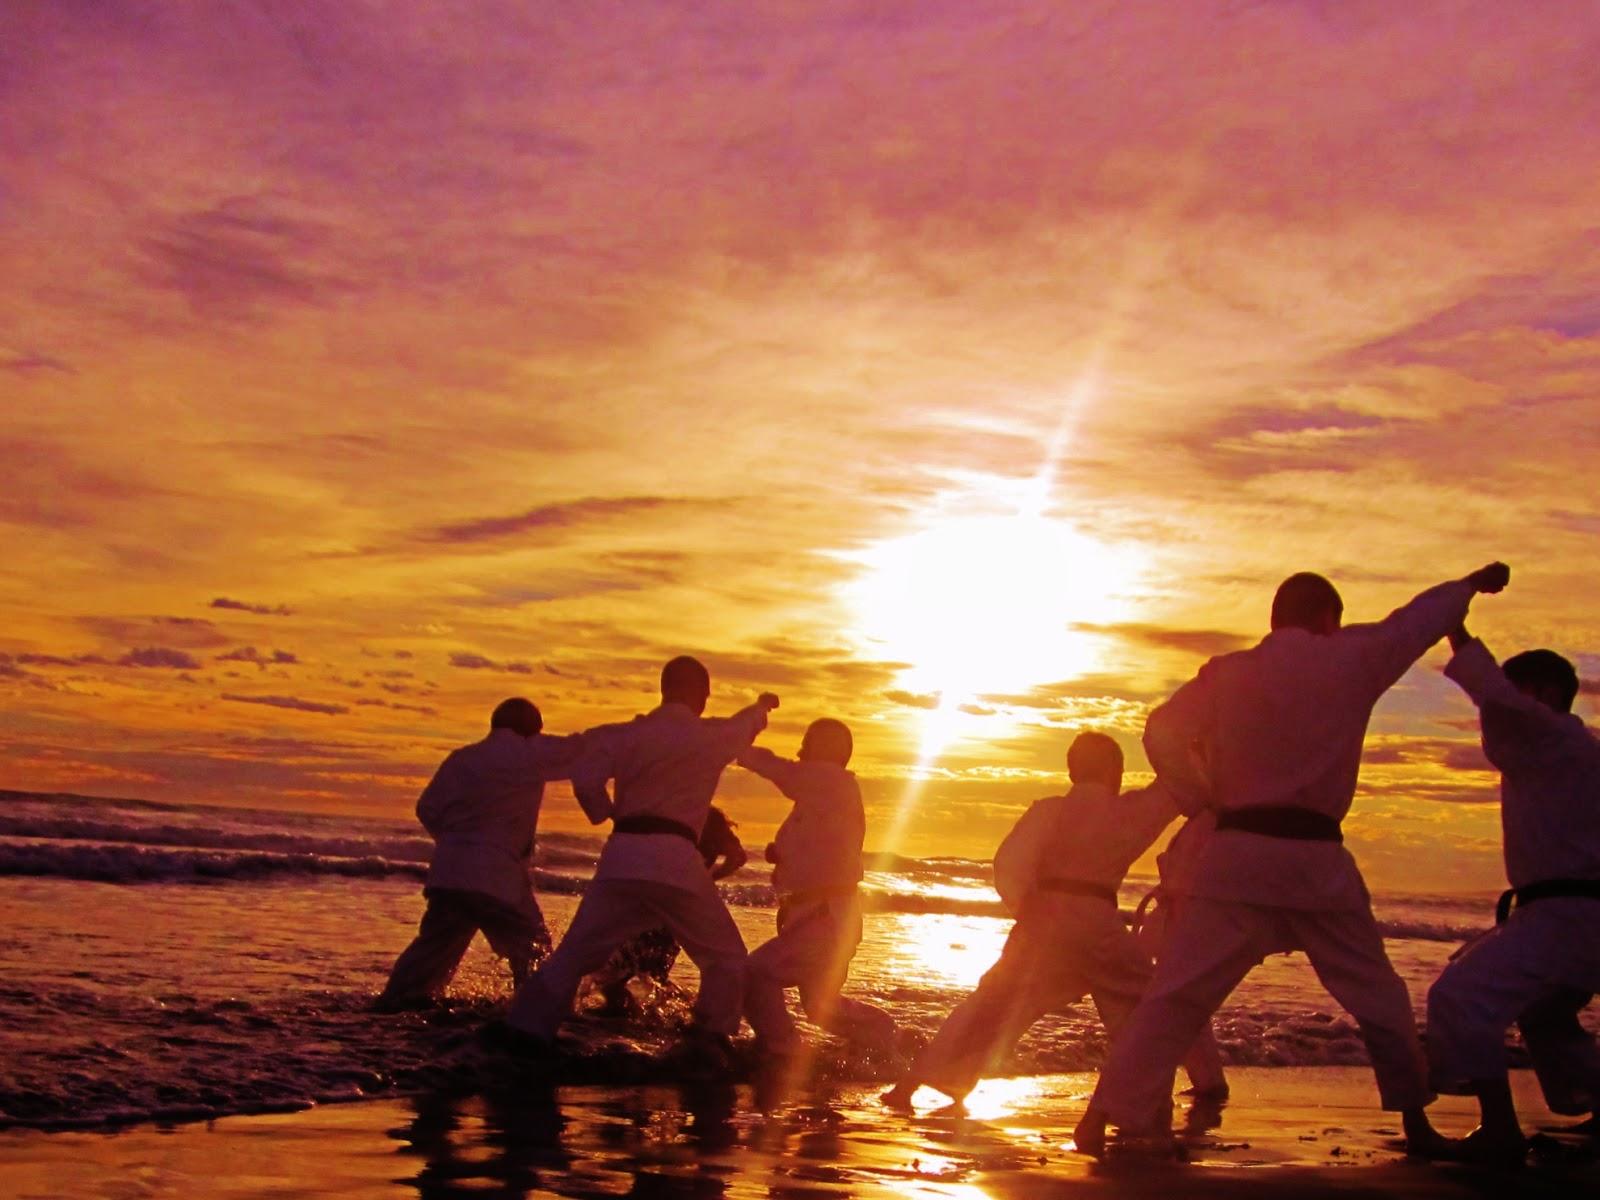 Free Download Shotokan Karate Wallpaper Christchurch